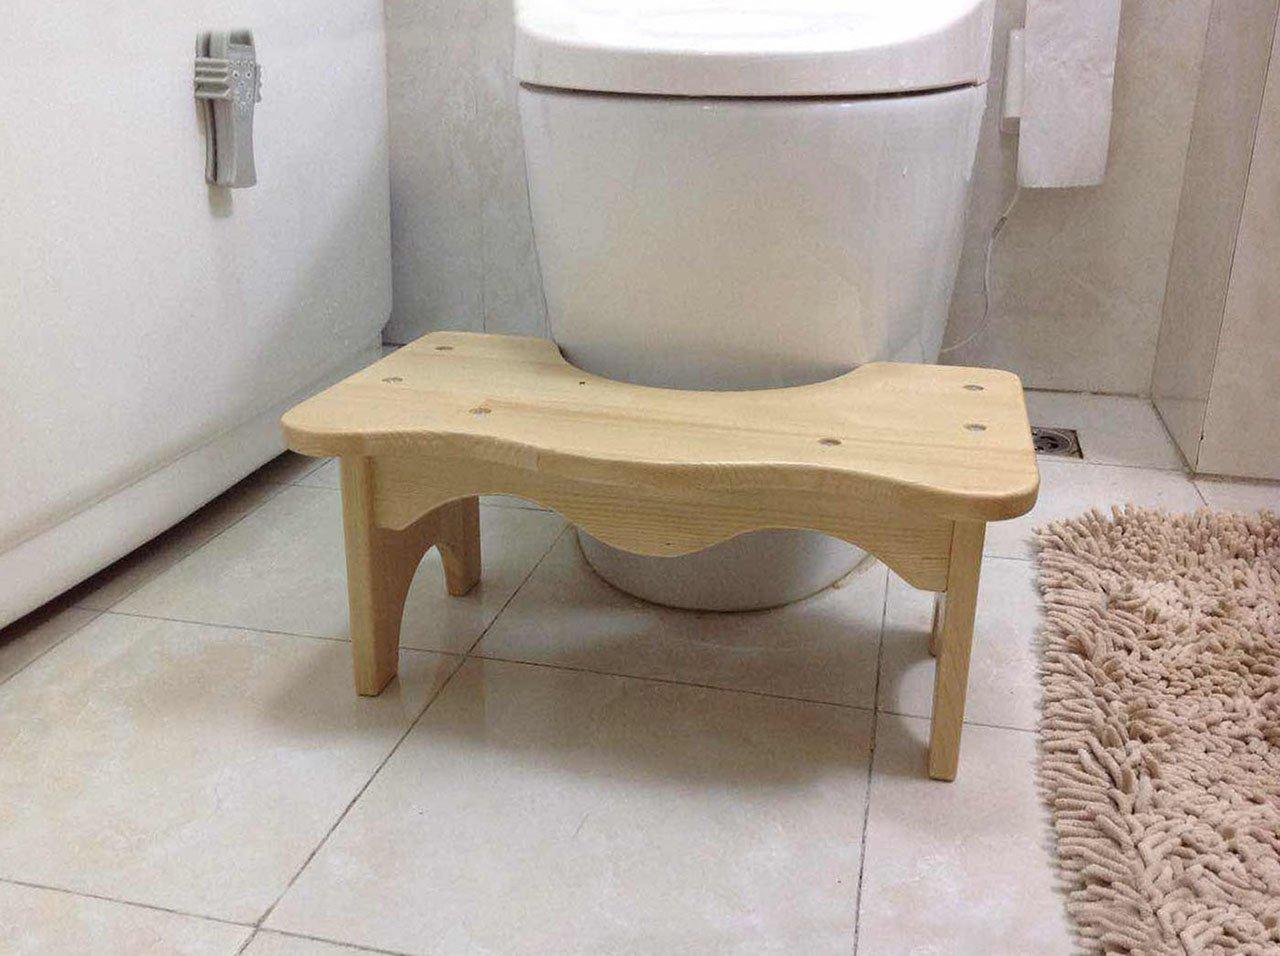 Pine Wood Toilet Step Stool Squatty Full Squat Seat Wooden Bathroom ...